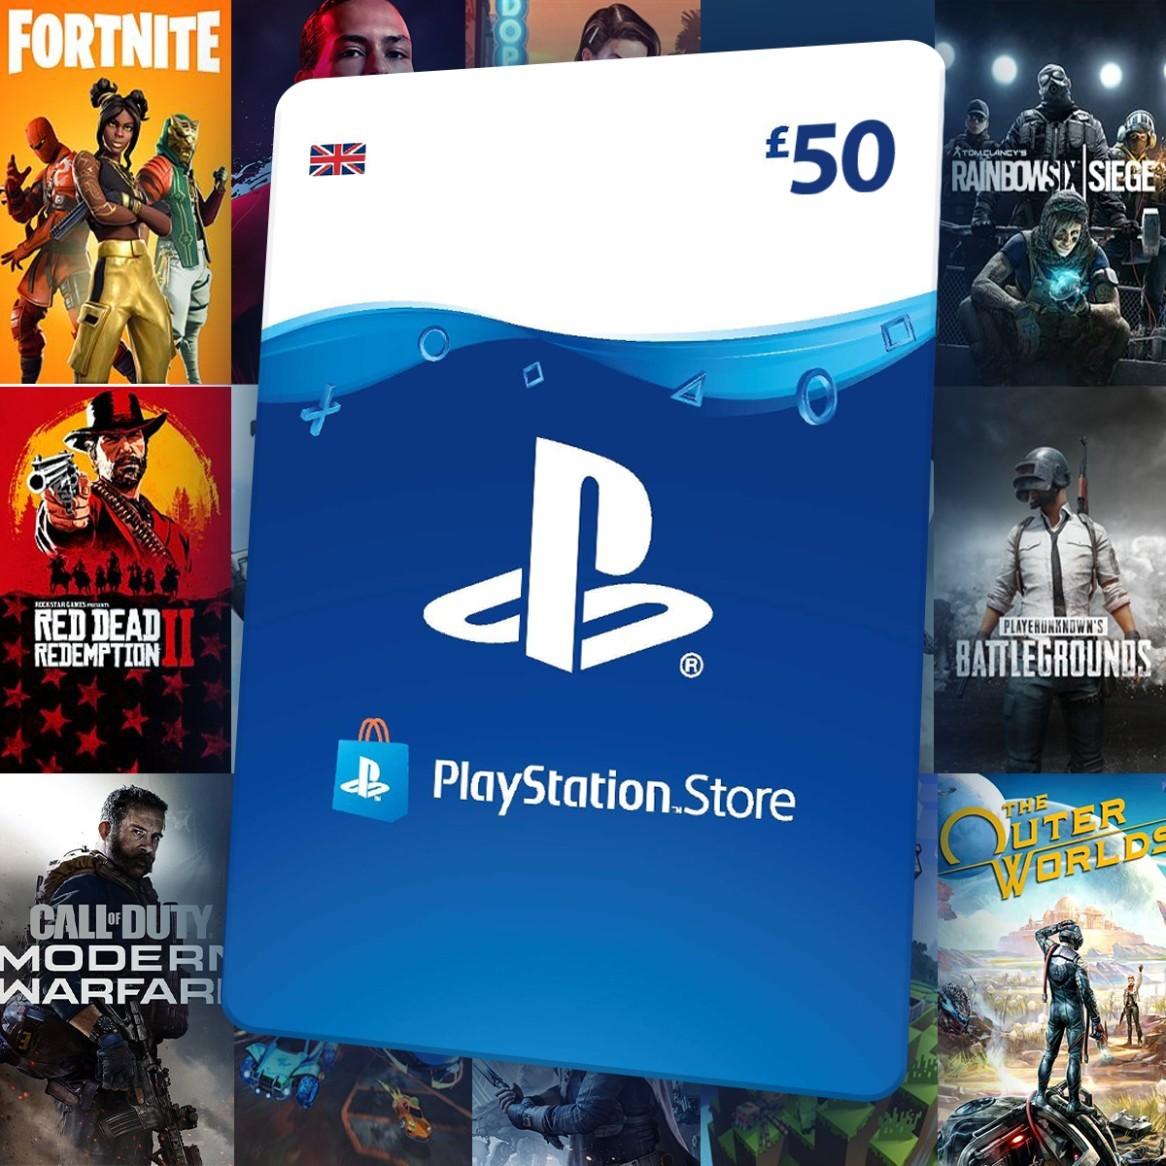 WIN - £50 Playstation Network (PSN) Gift Card